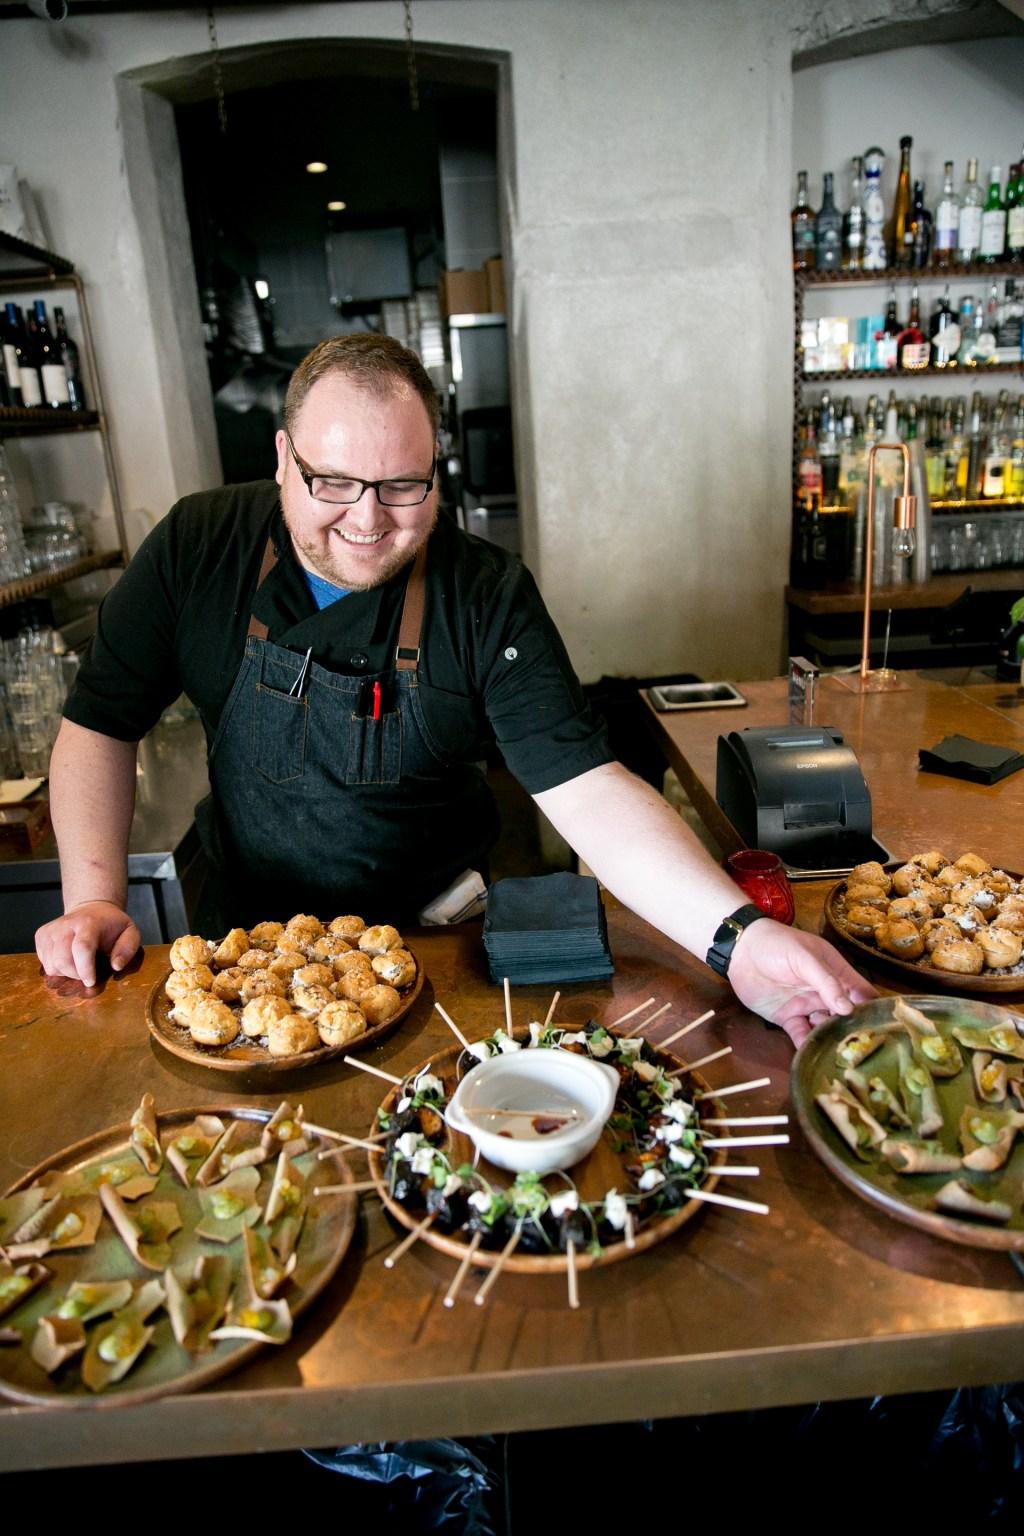 Chef Maximillian Petty, of Eden Hill, prepares local Seattle fare including crispy octopus, sea scallop madrone bark, Eden Hill foie gras cake batter with strawberries and more…